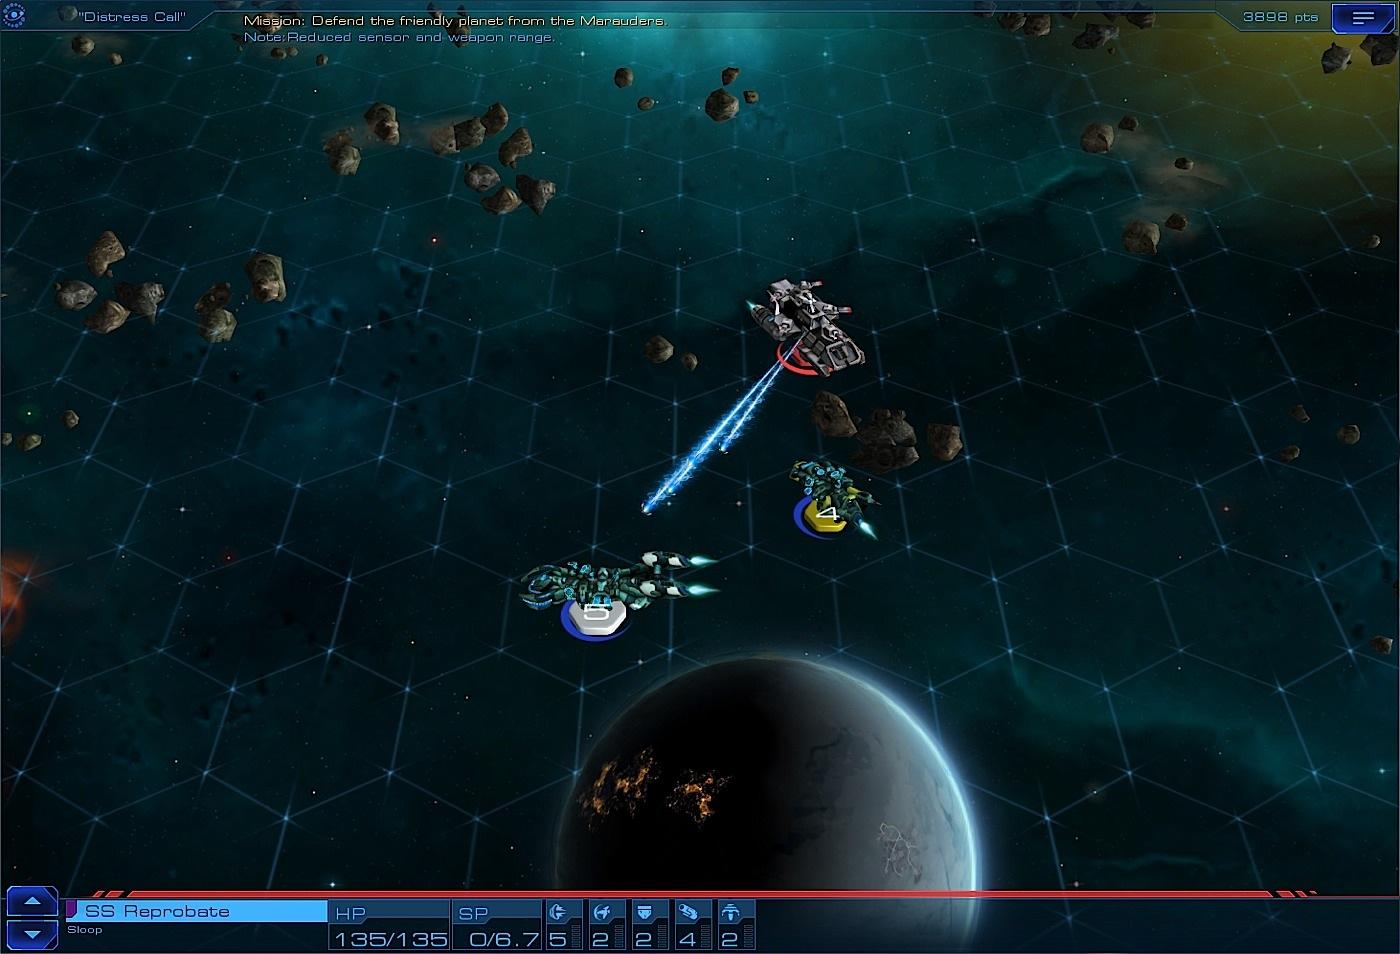 Sid Meier's Starships combat marauder screenshot.